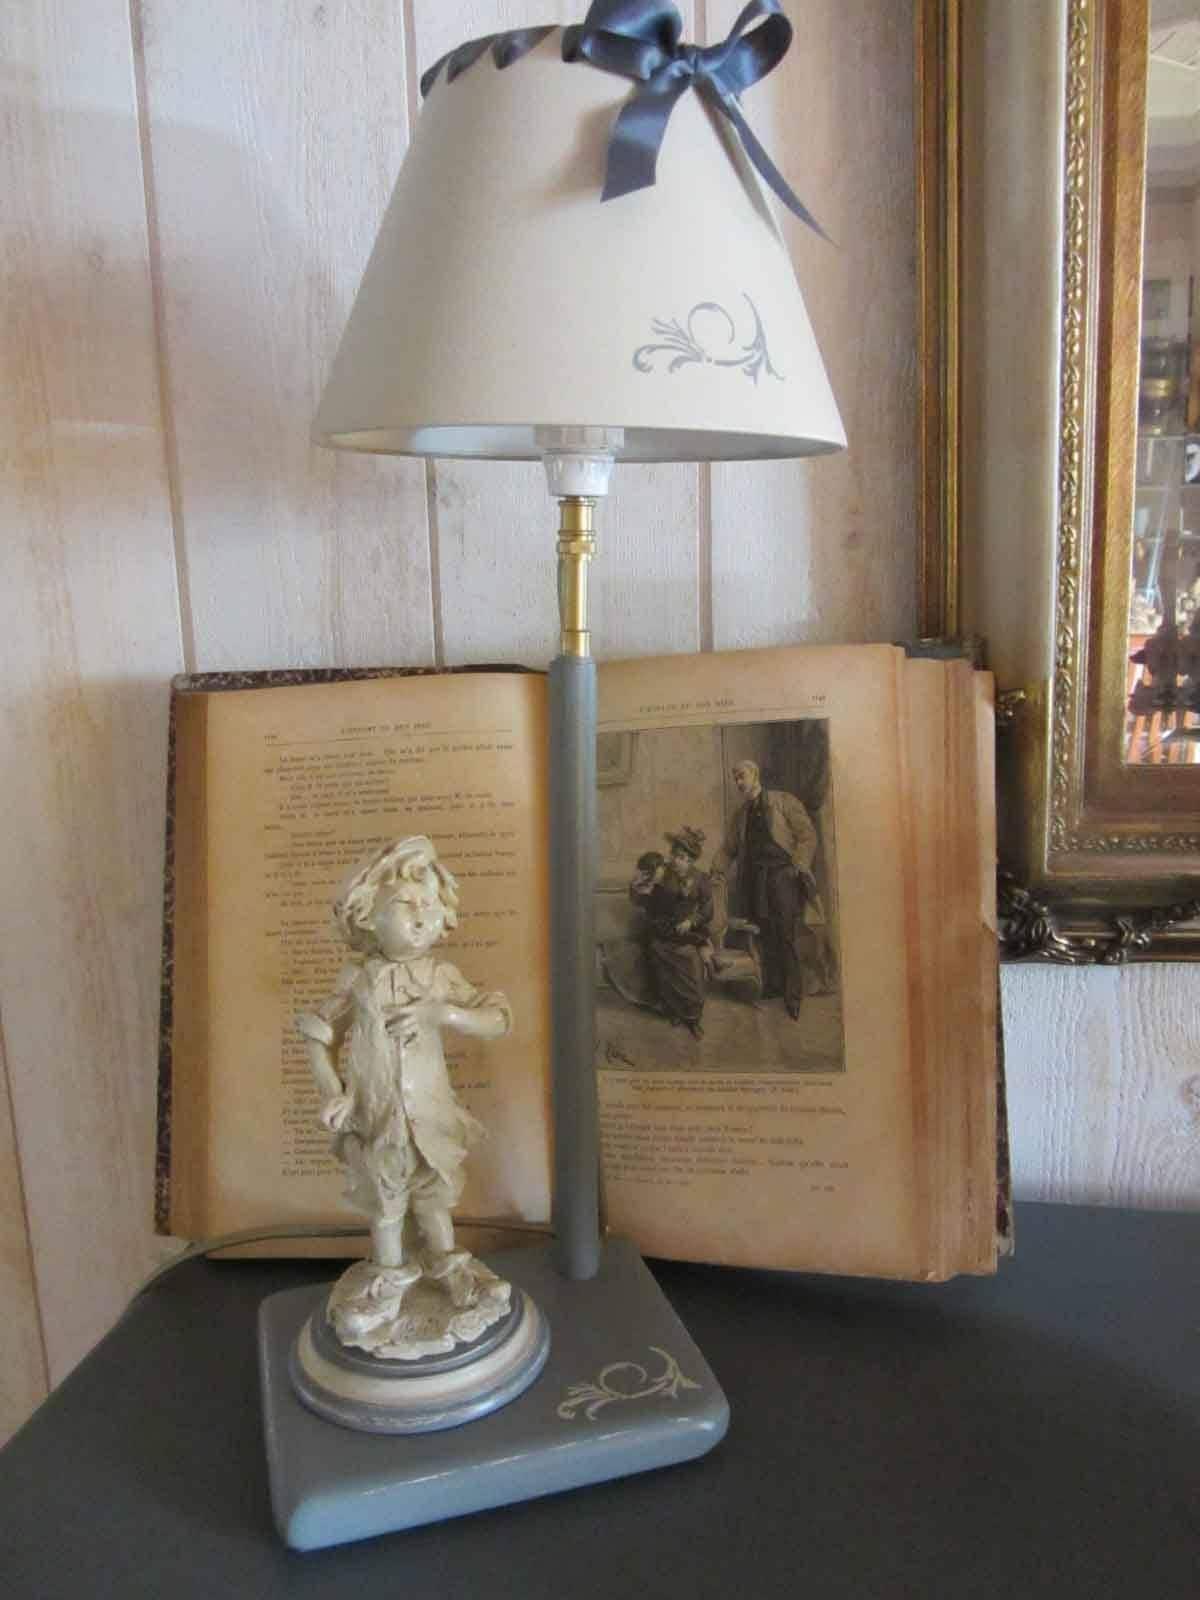 Lampe de chevet gar on - Lampe de chevet garcon ...